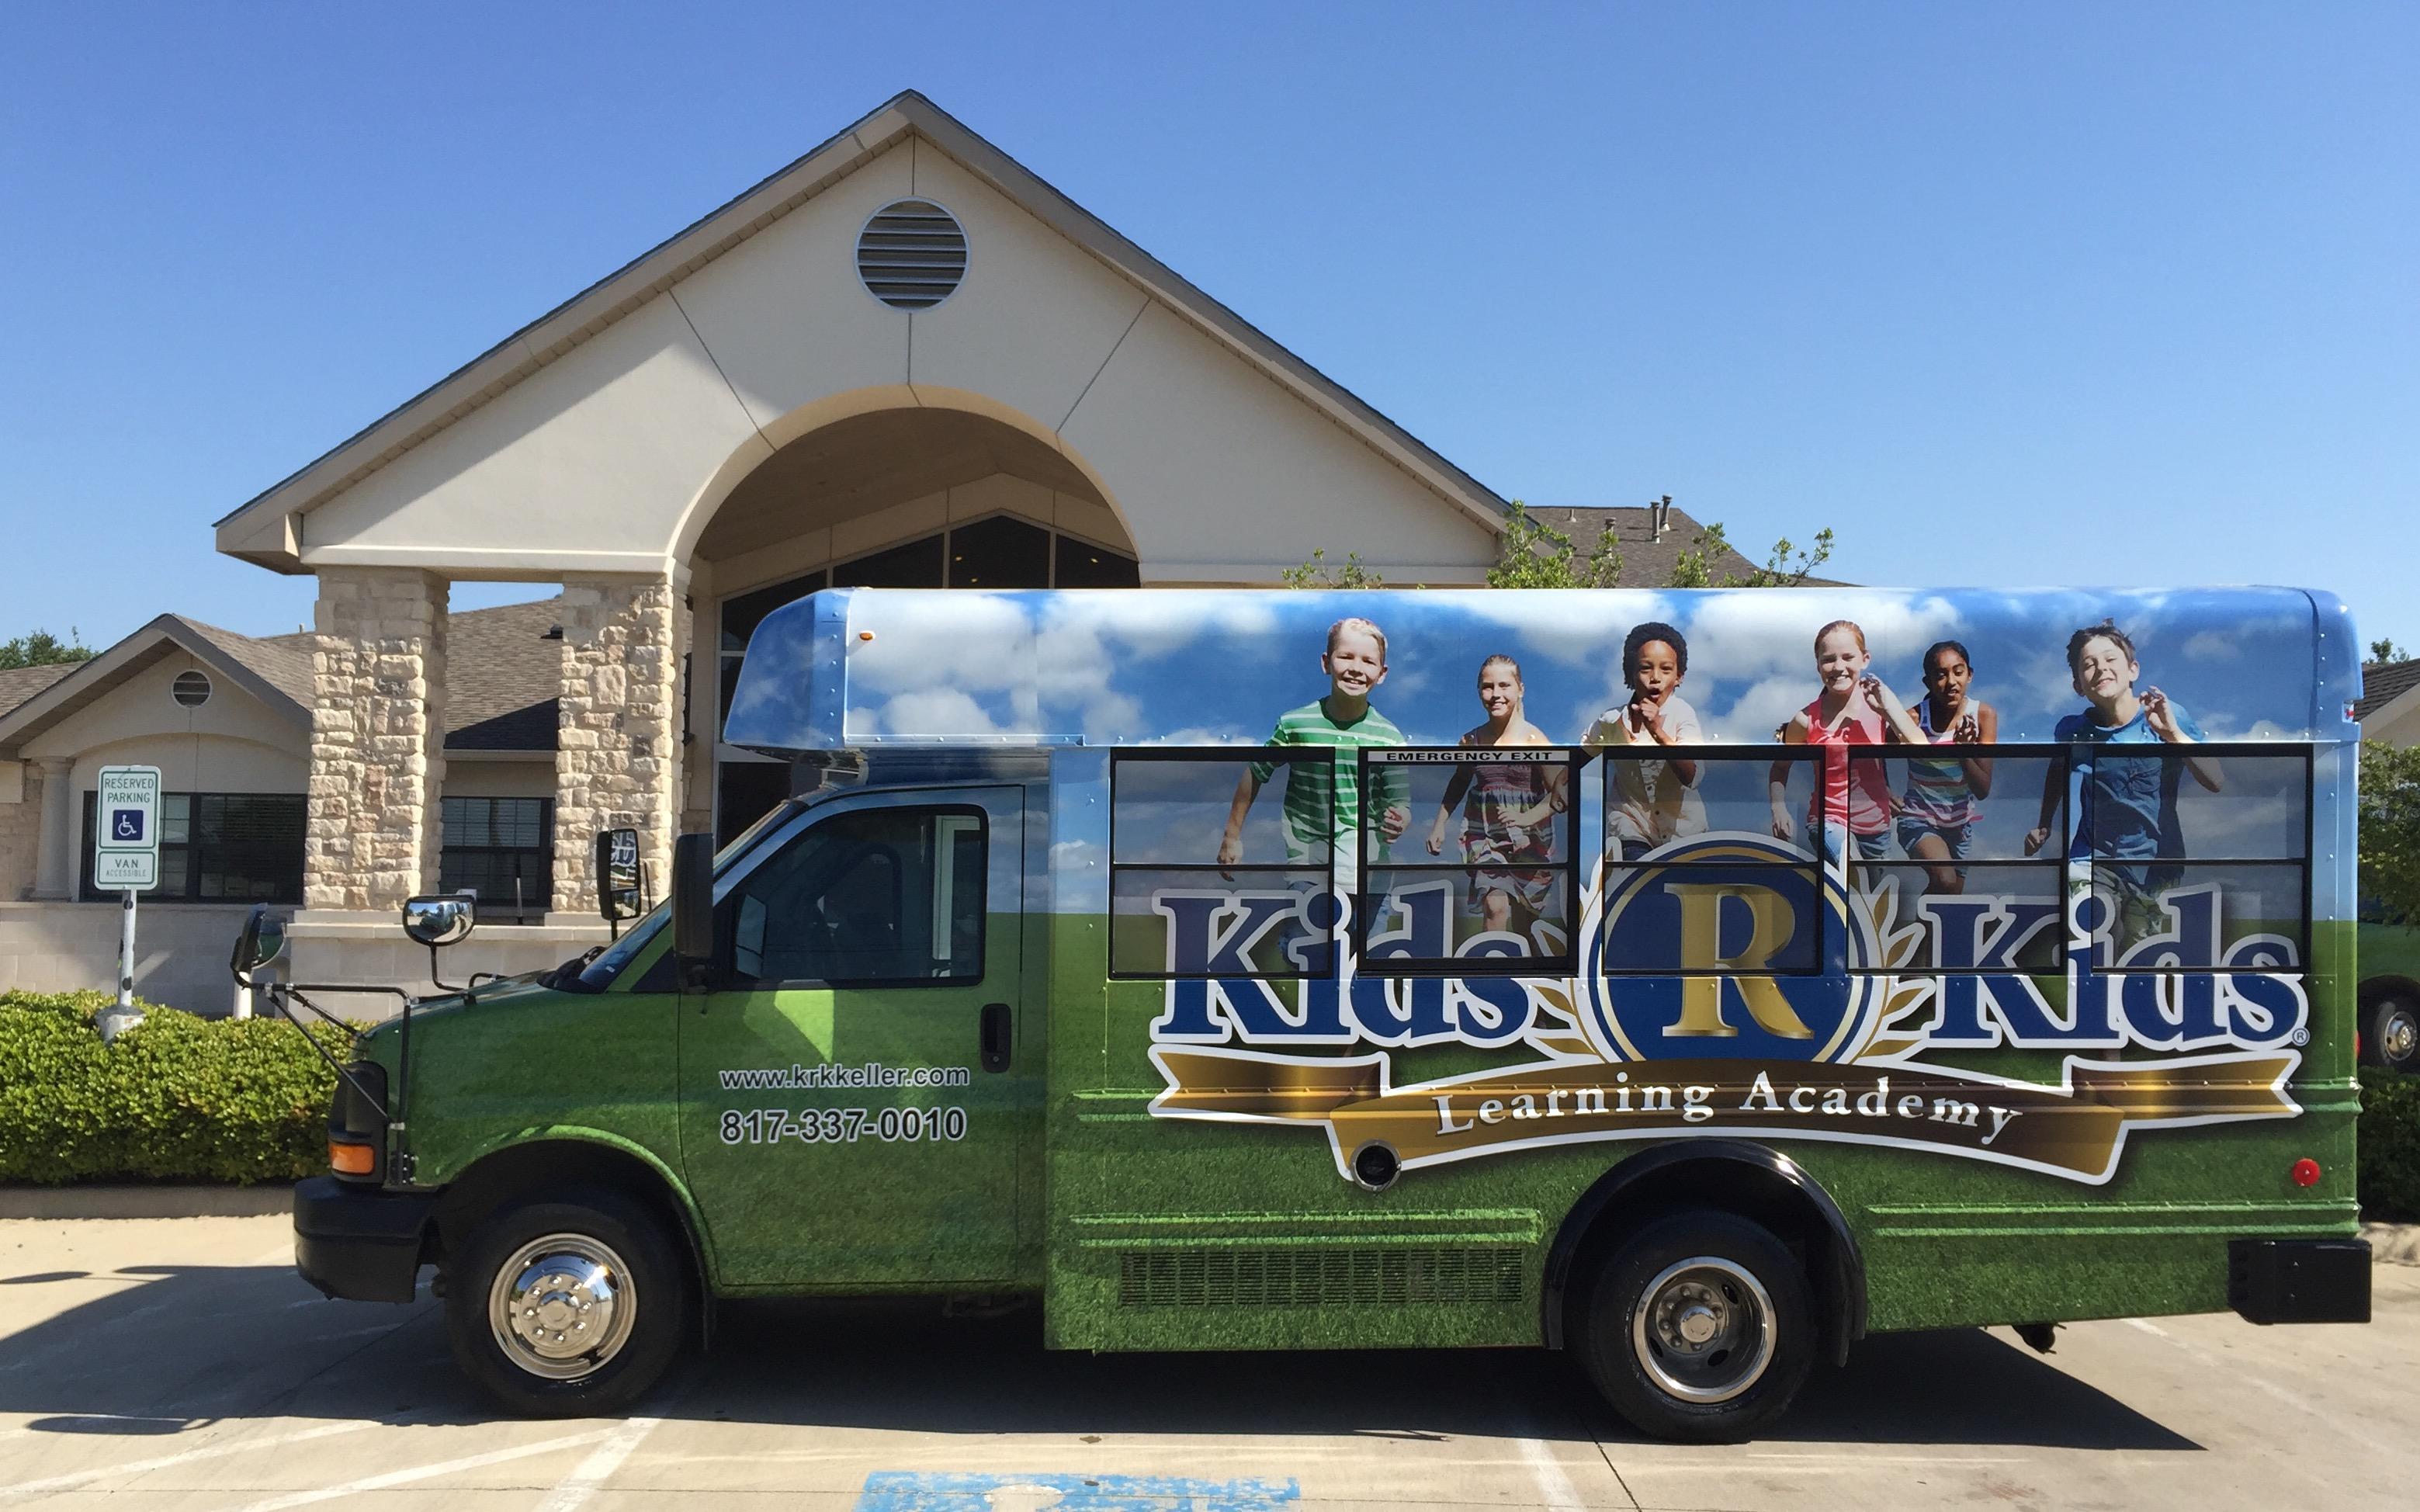 Kids 'R' Kids Learning Academy of Keller